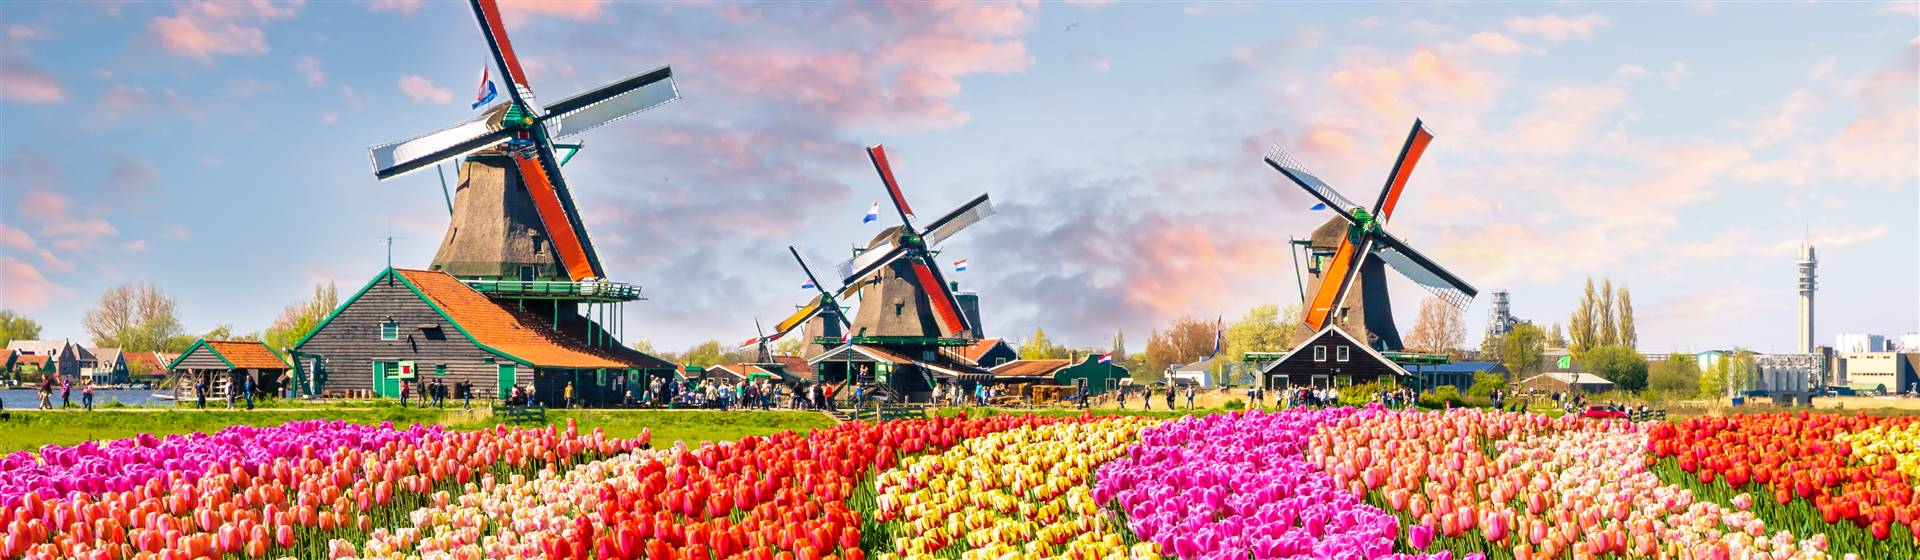 "<img src=""tulipswindmills©shutterstock.jpeg"" alt=""Windmills and Tulips""/>"